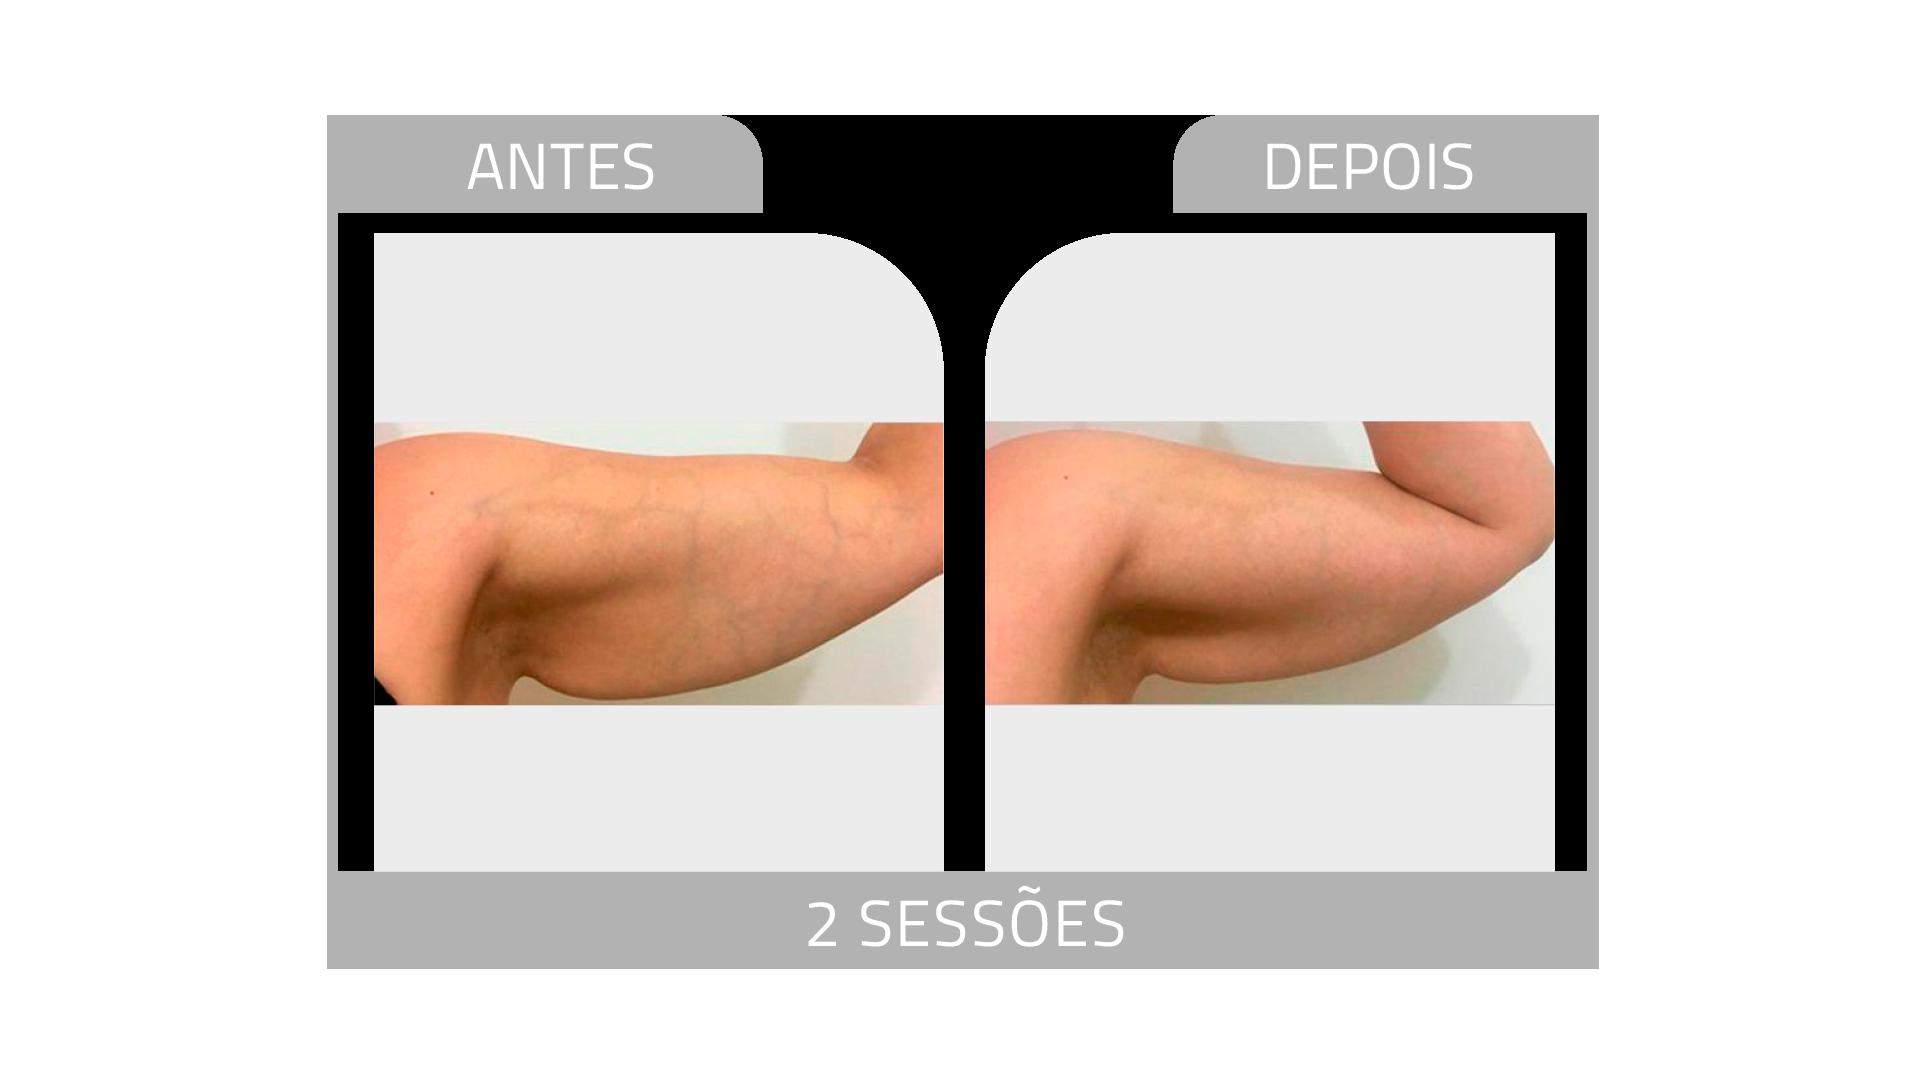 ANTES E DEPOIS FIRMEZ 1.png